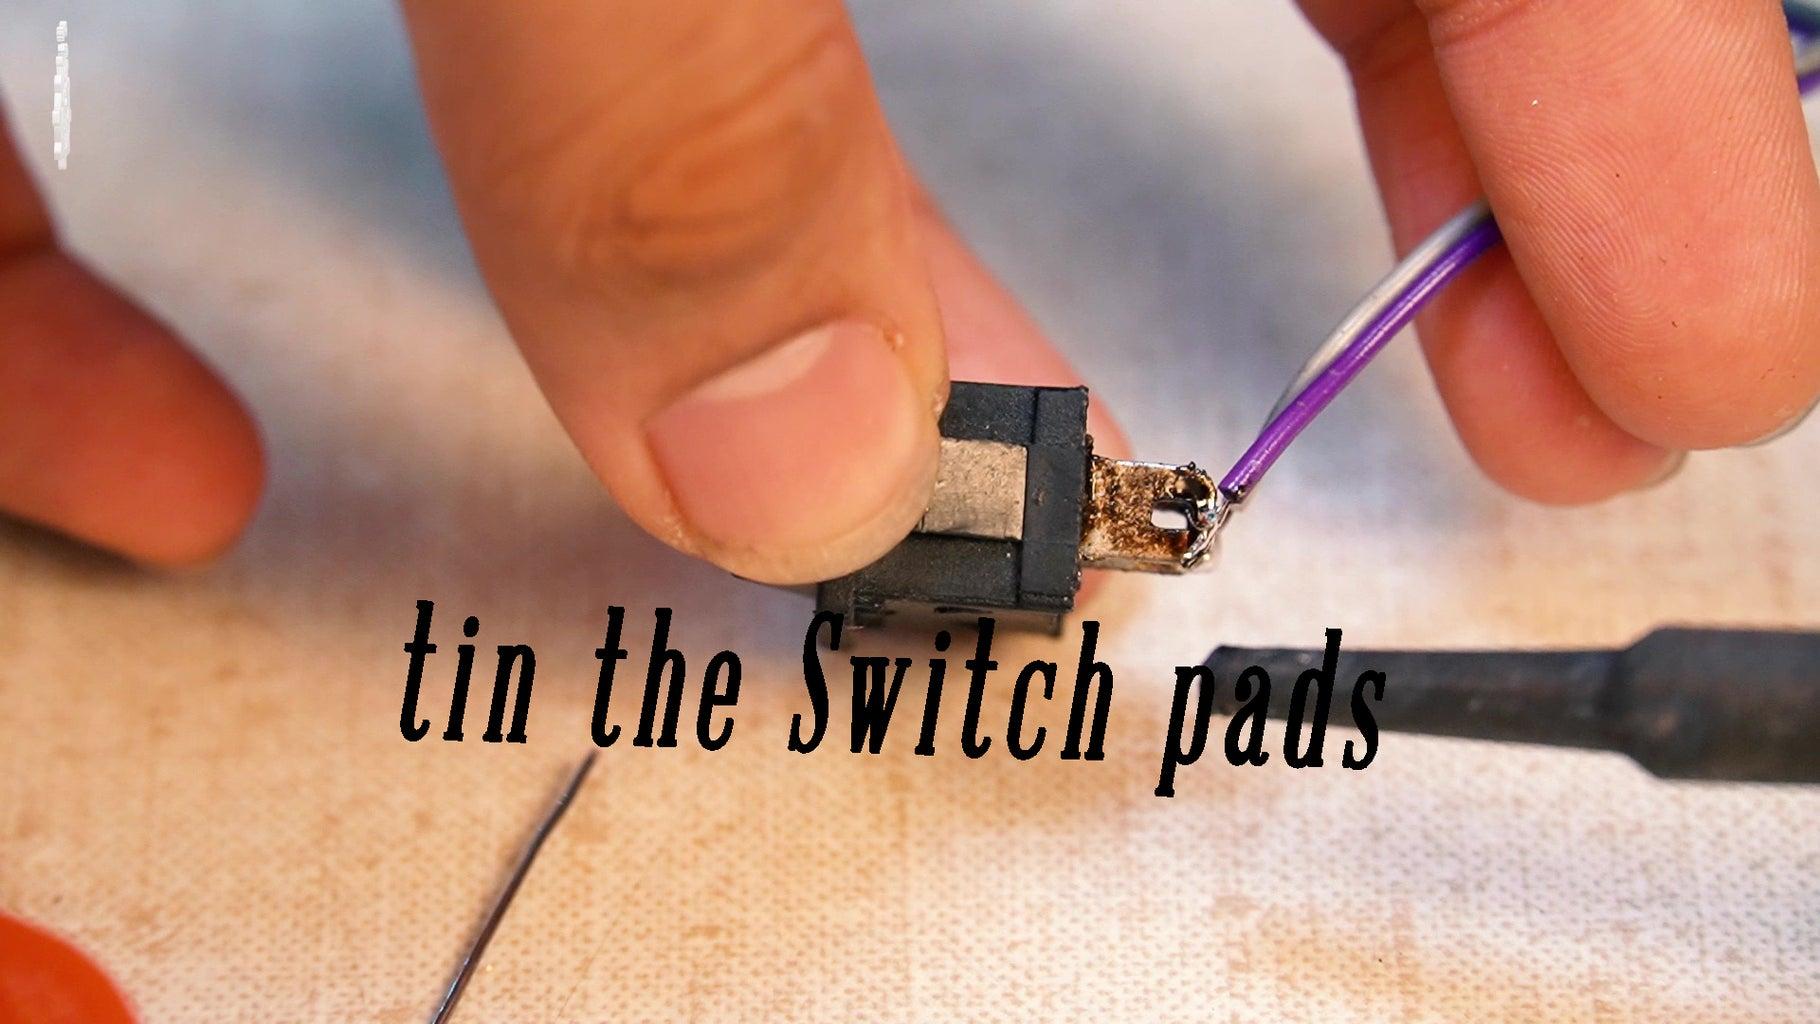 Add Switch